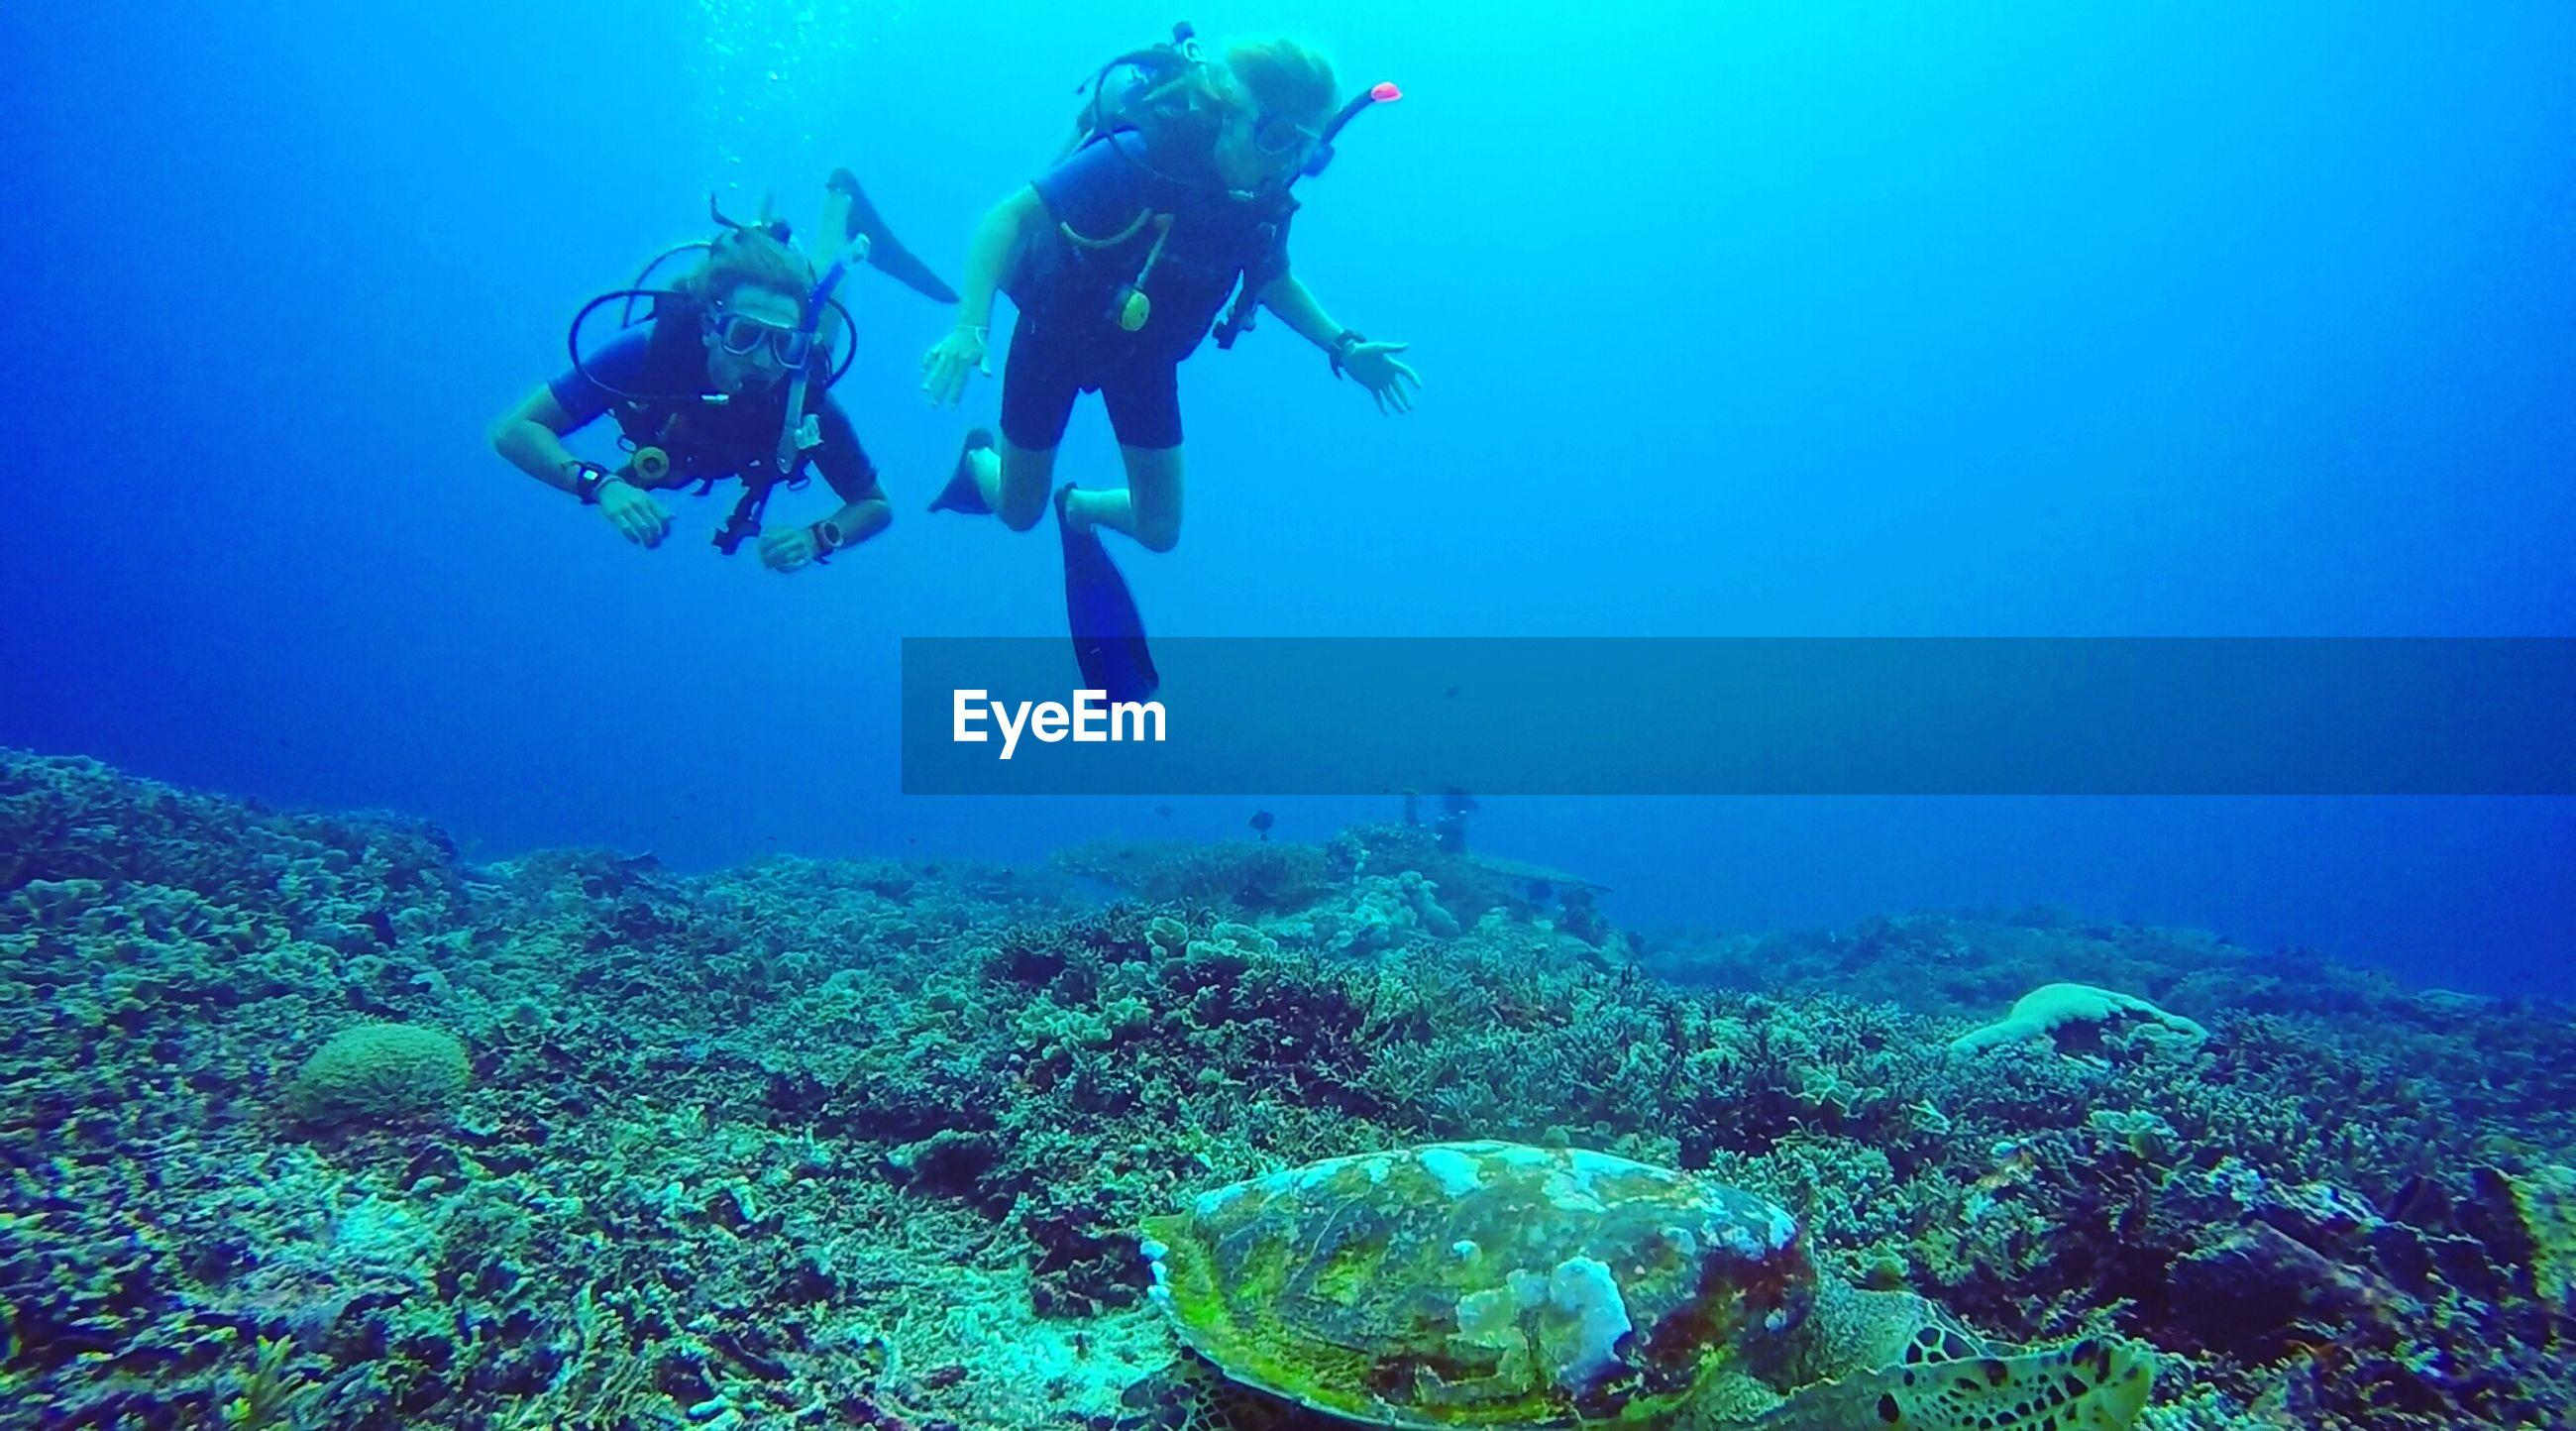 Men snorkeling in sea